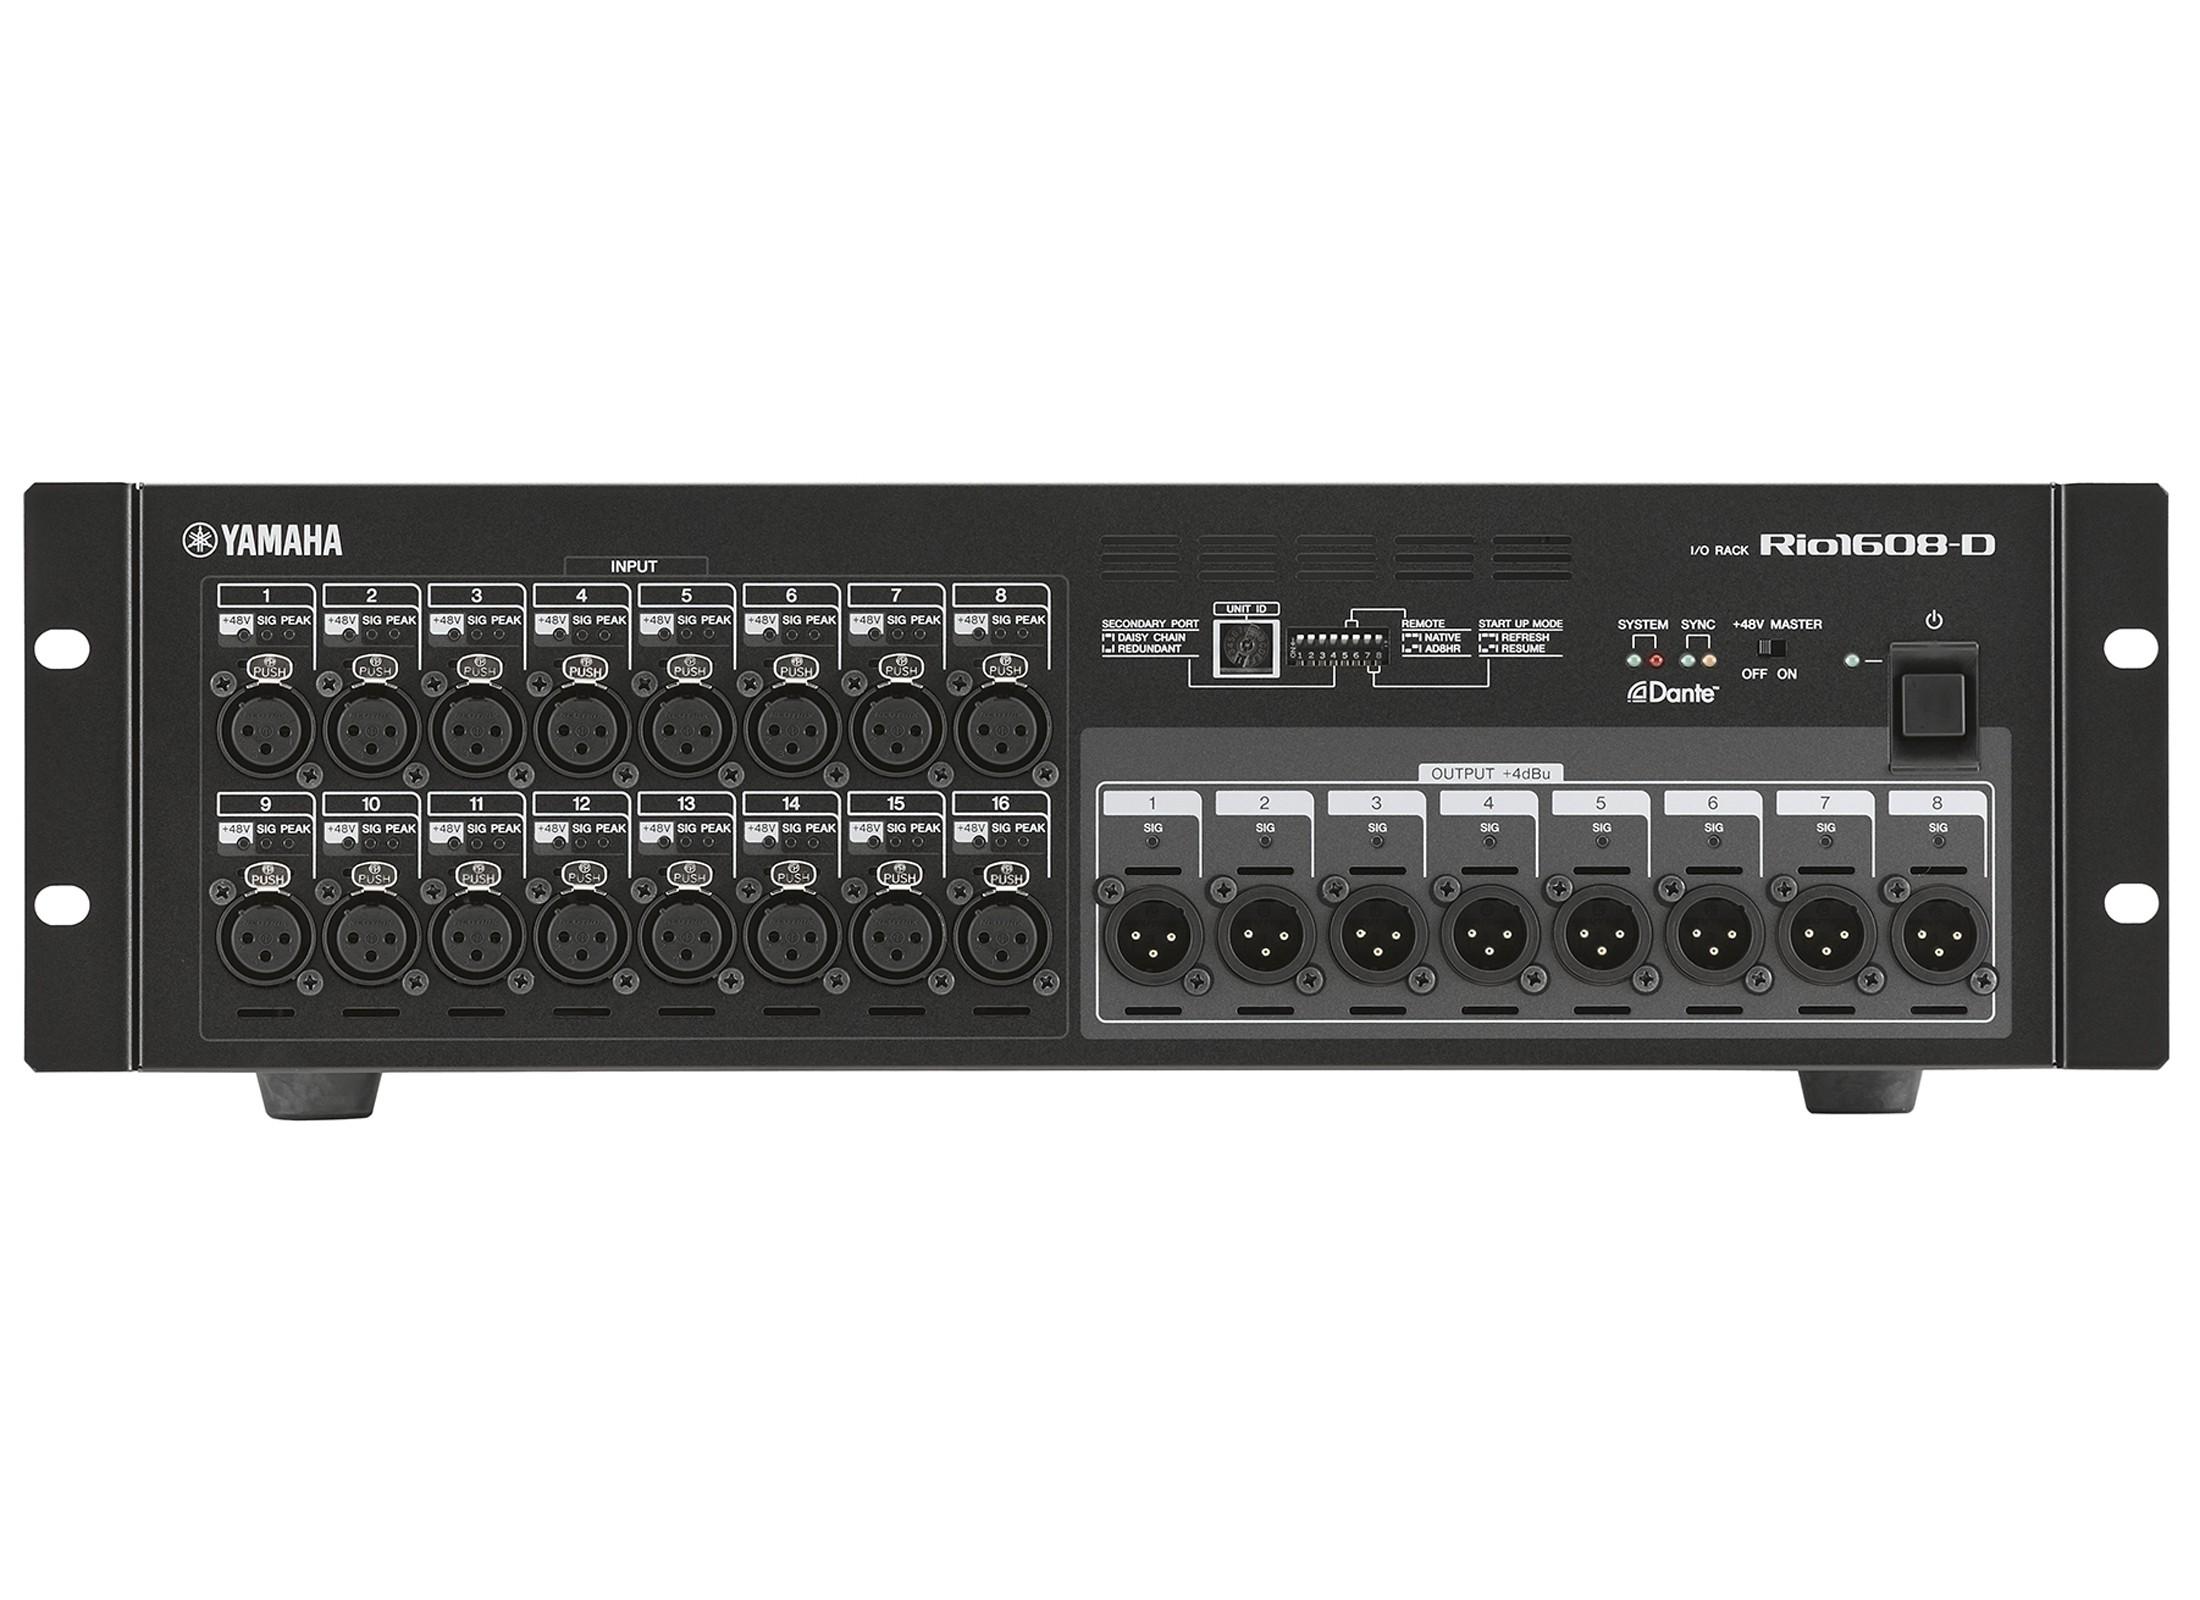 Yamaha Rio 1608-D Digital StageSpeaker - 2